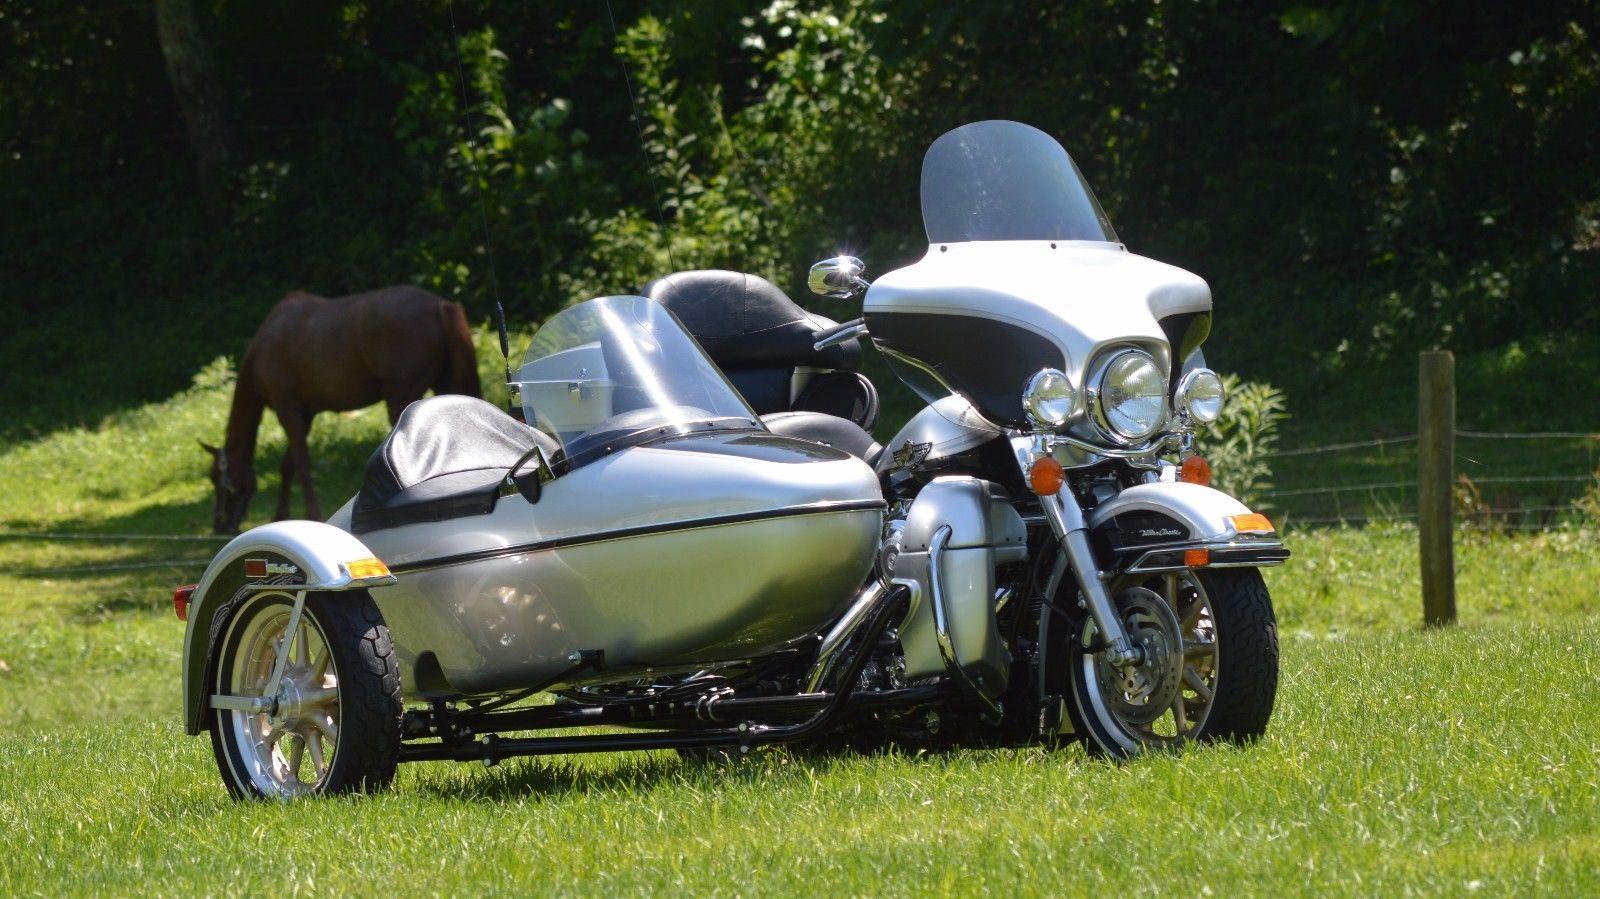 eBay: 2003 Harley-Davidson Touring 2003 Harley Davidson Ultra Classic w/ Sidecar just 27mi!! #harleydavidson